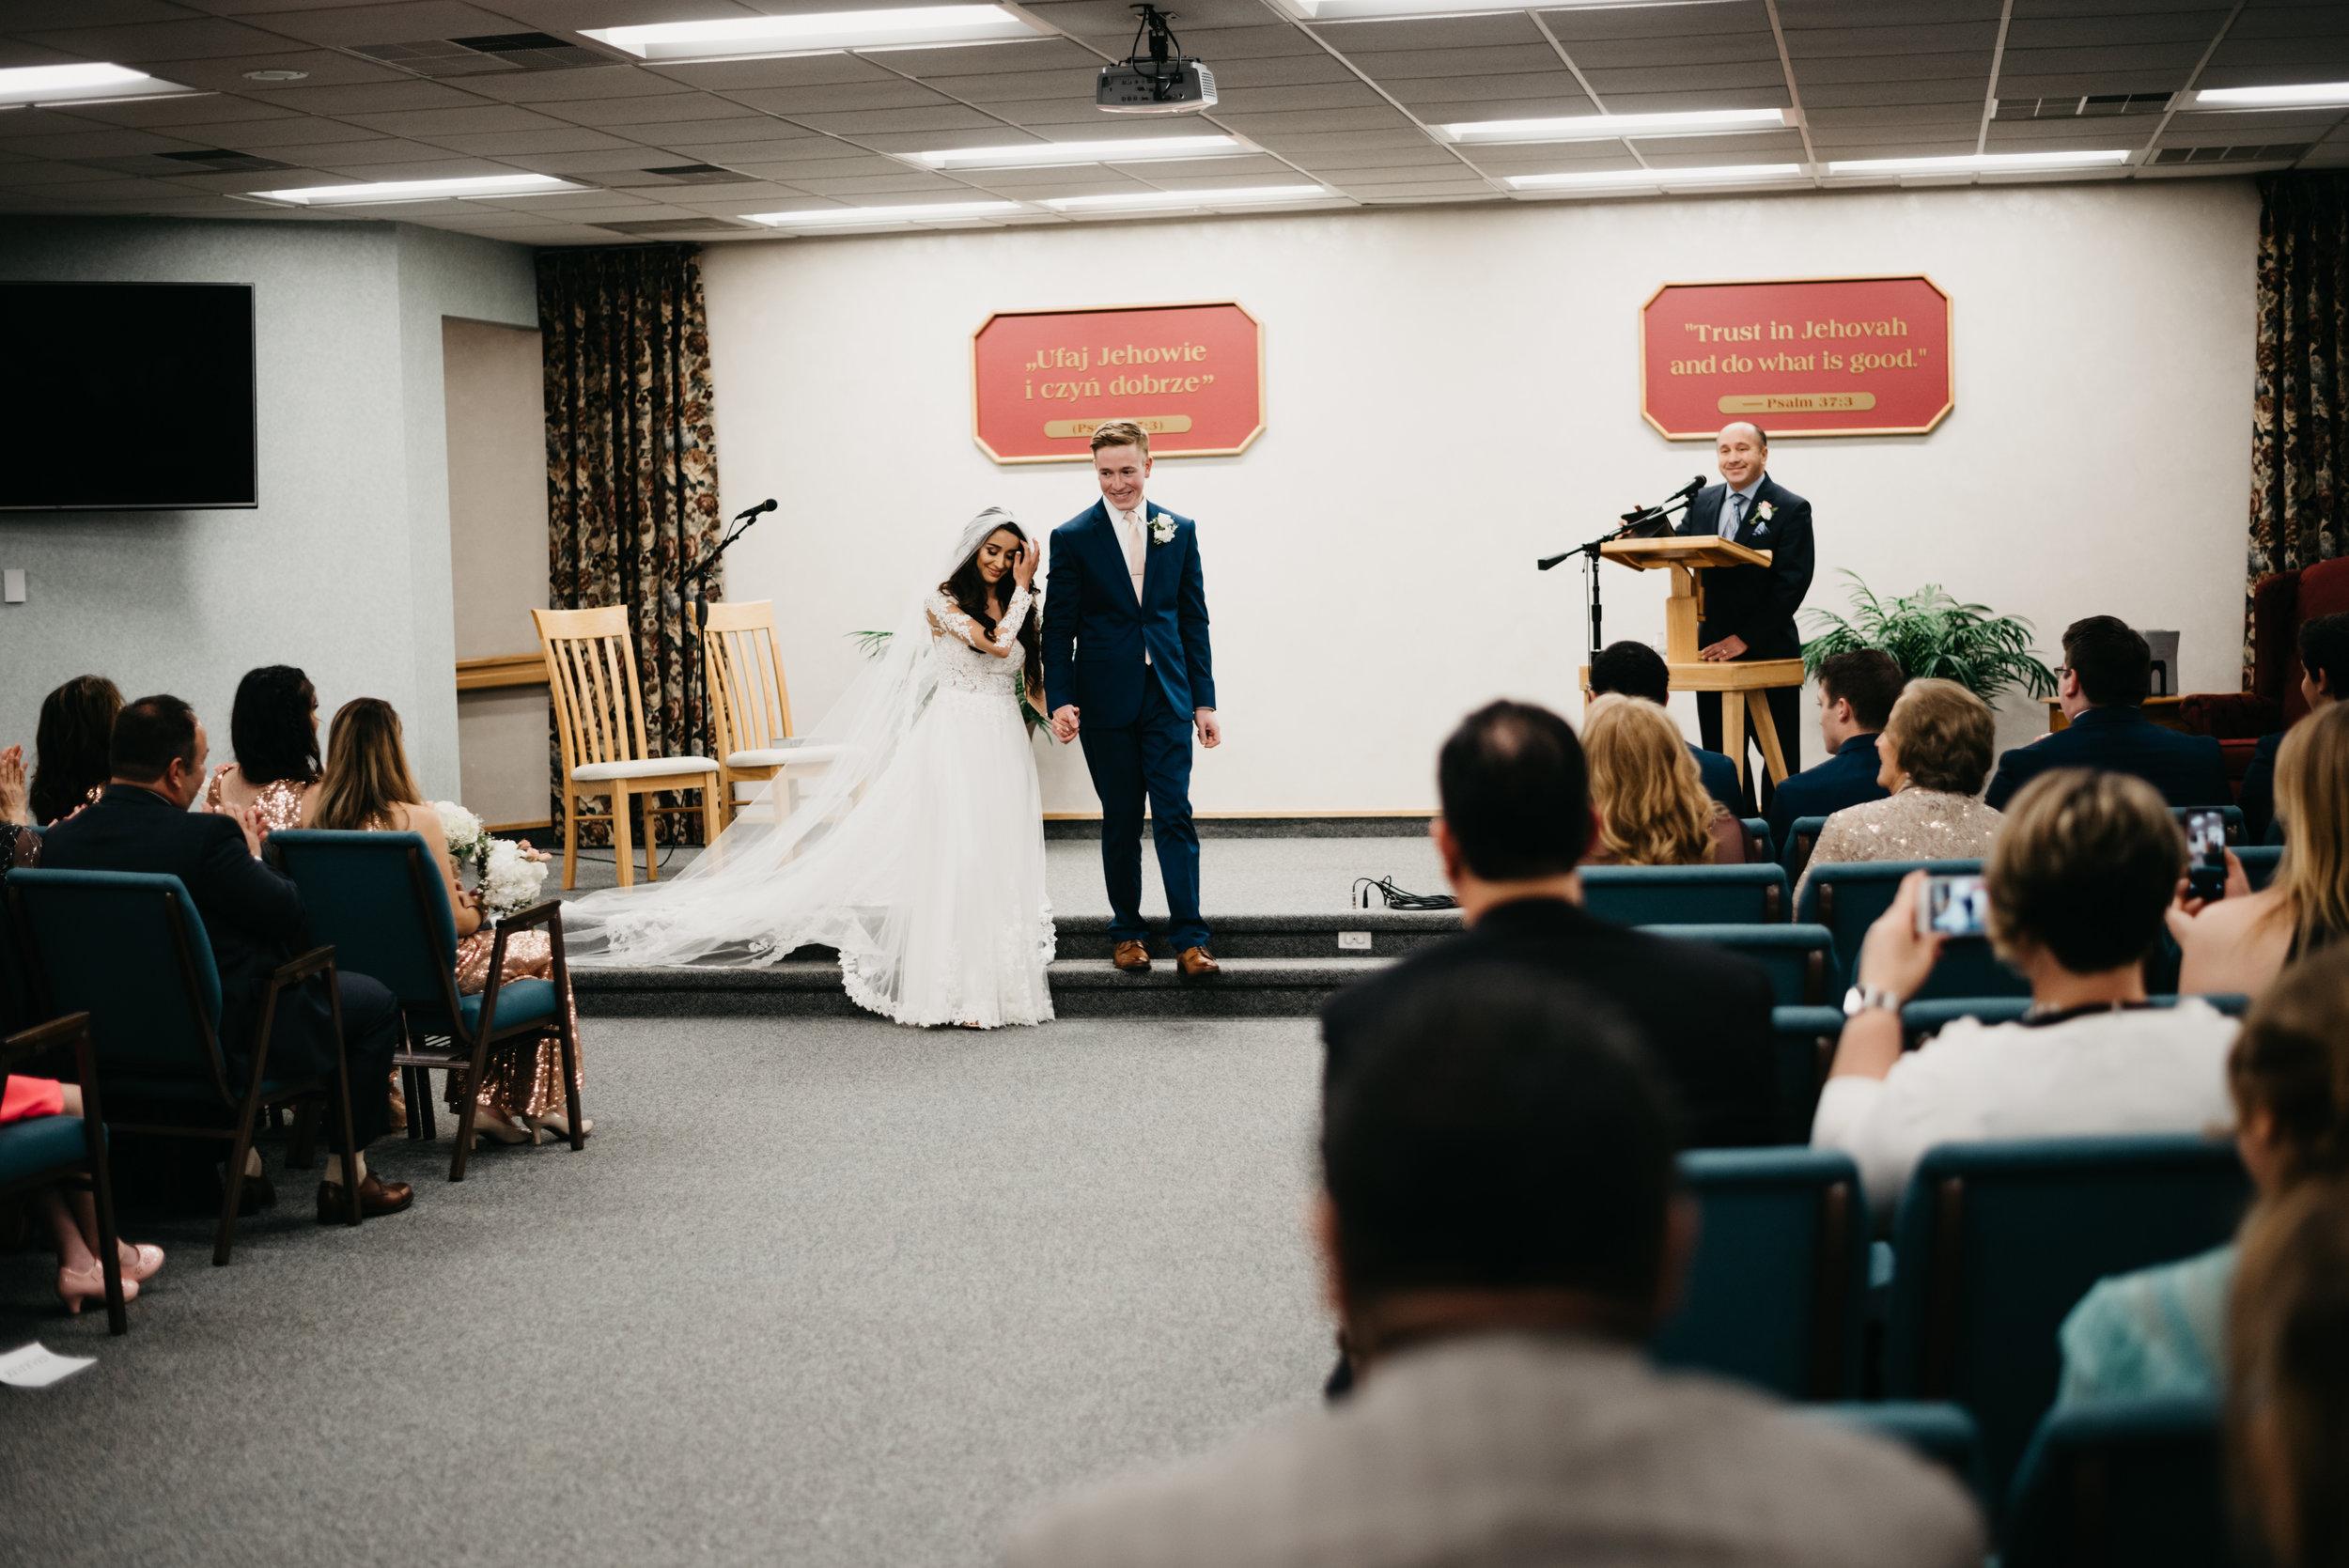 Barch-Massachusetts-Lakeside Tent Wedding-Western Massachusetts Wedding Photographer-01275.jpg